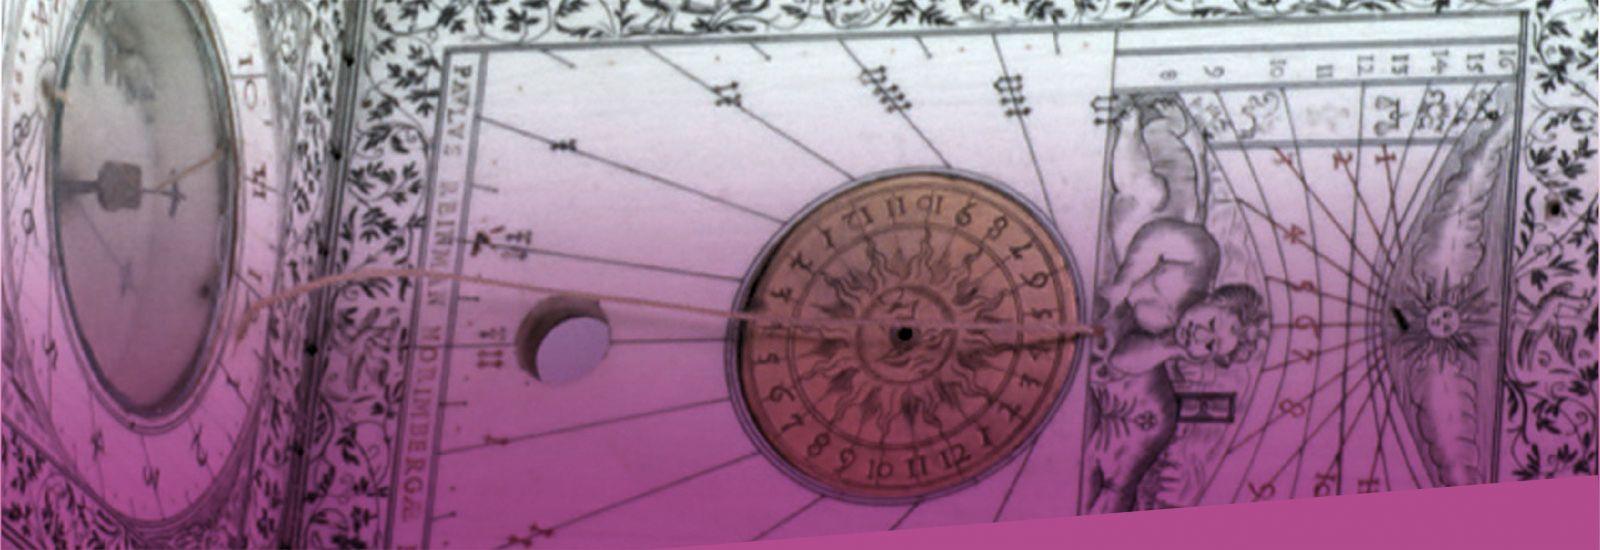 an old compass